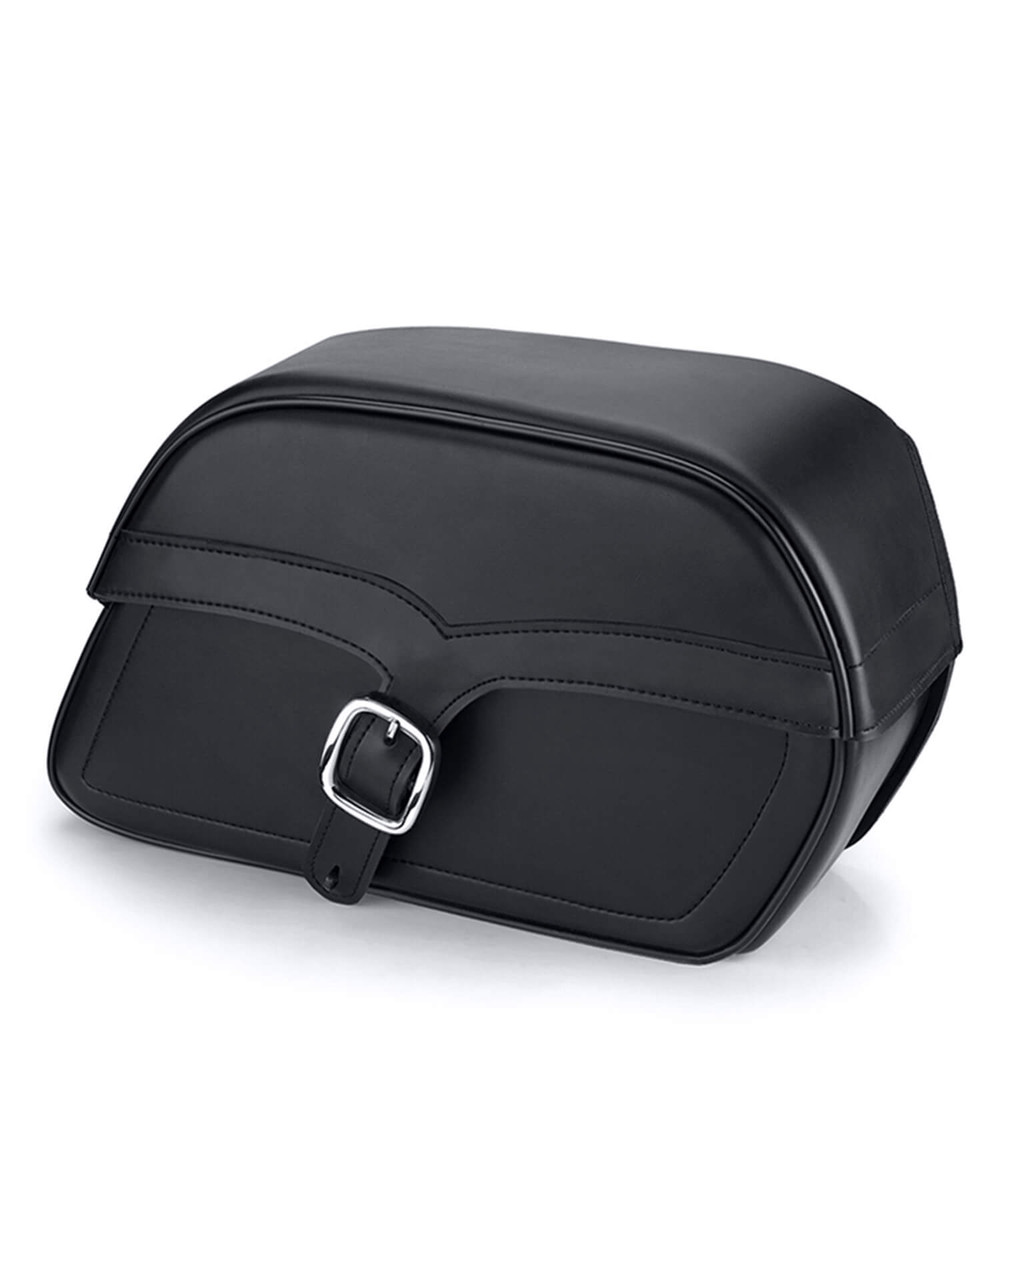 Honda 1500 Valkyrie Standard SS Slanted L Motorcycle saddlebags Main Bag View